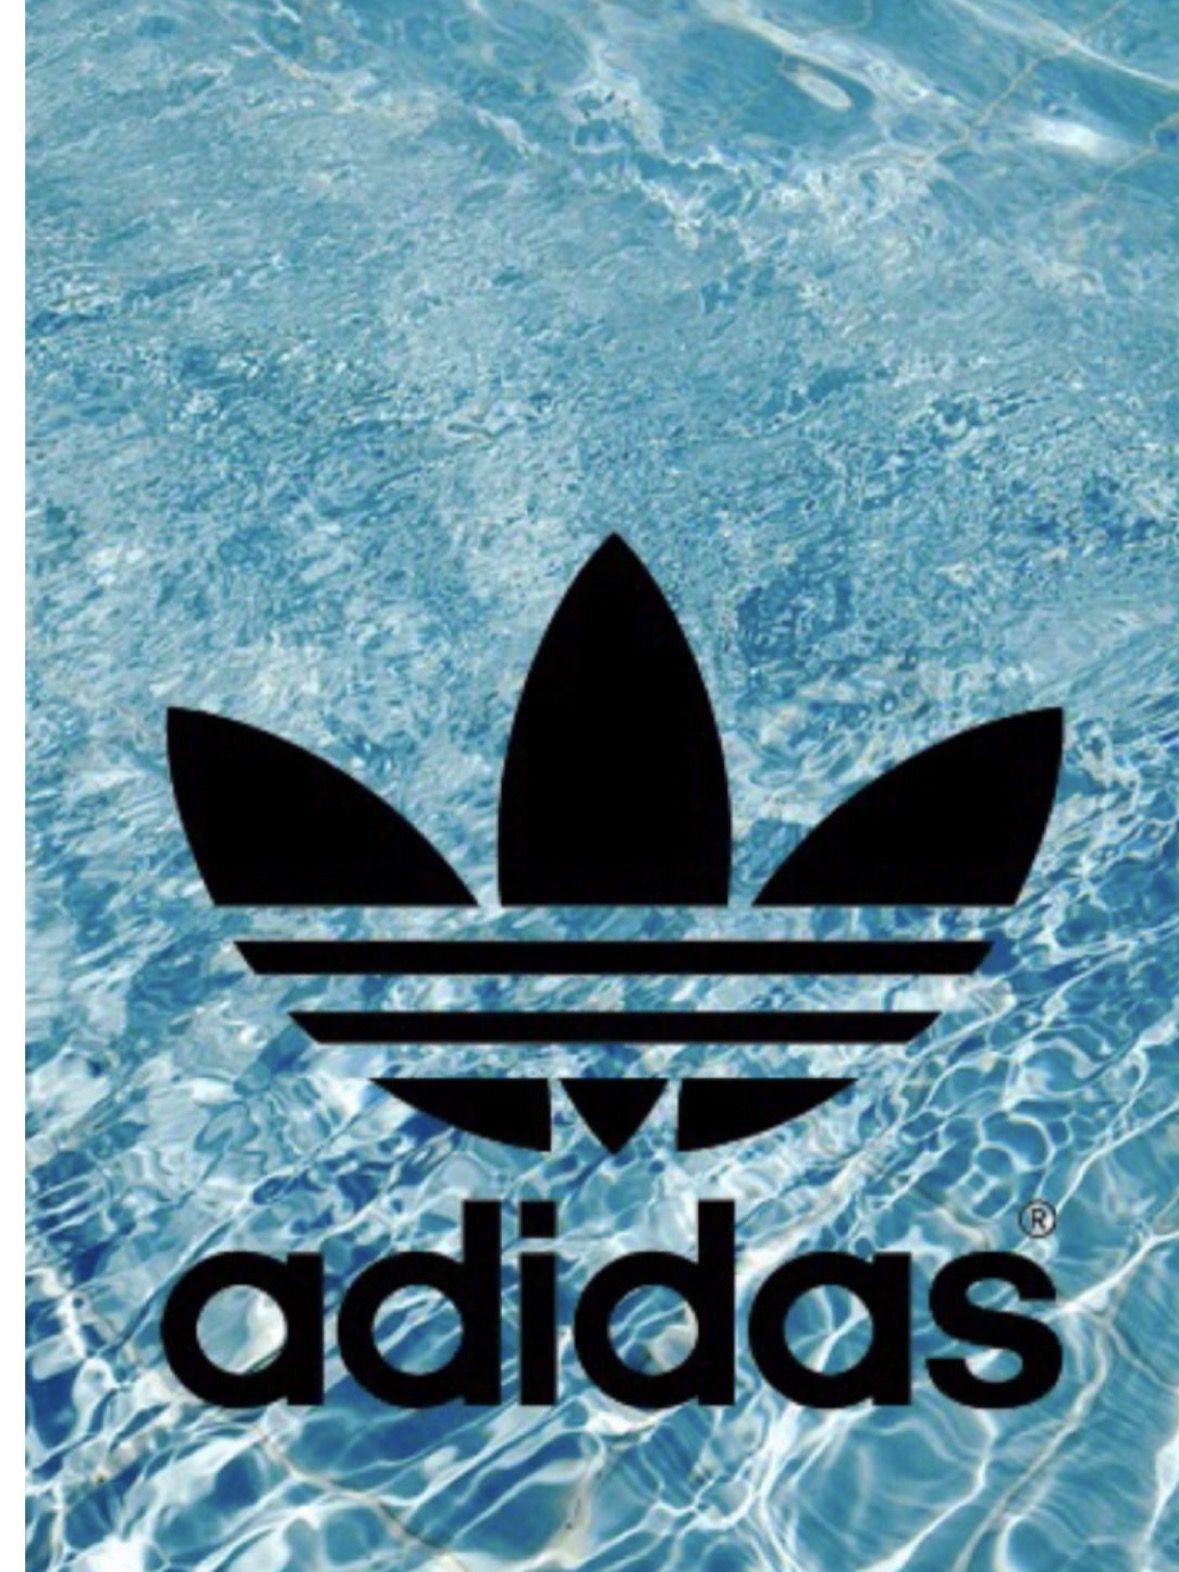 Tumblr iphone wallpaper adidas - Adidas Sport Iphone Wallpapers